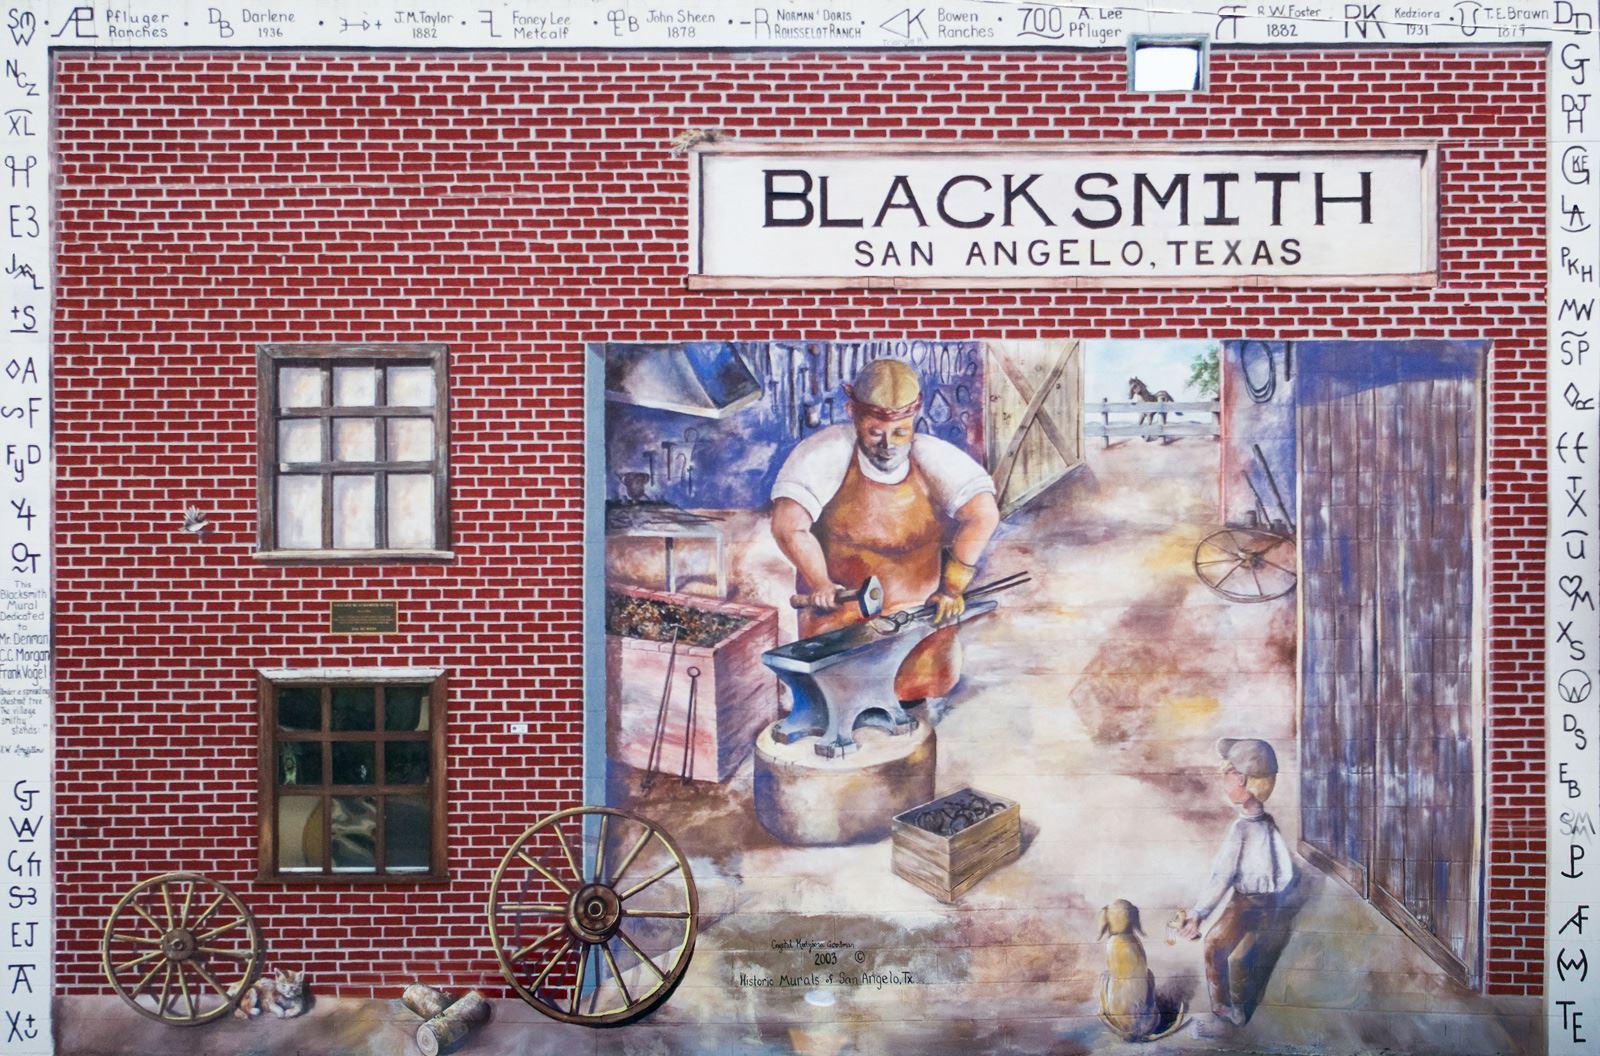 The Blacksmith Mural